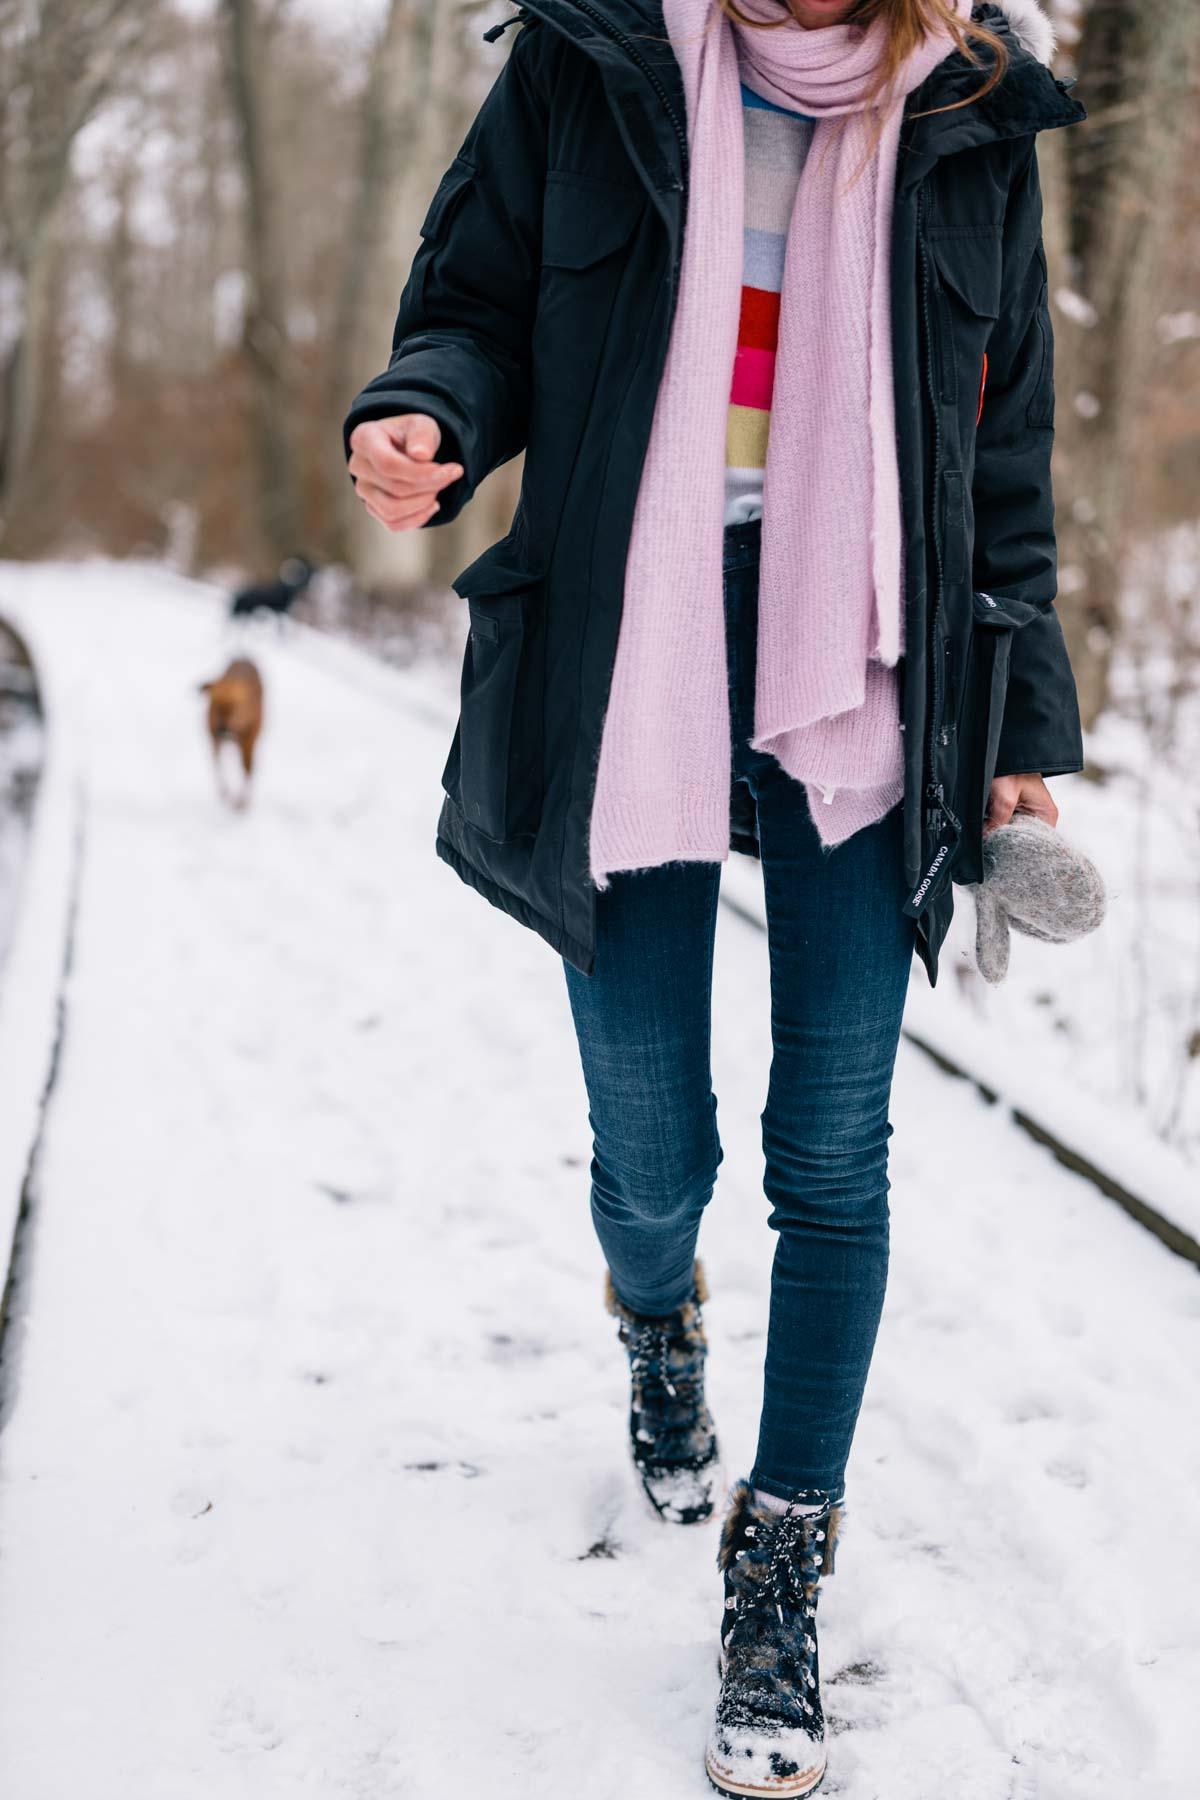 Jess Ann Kirby canada goose jacket skinny jeans winter